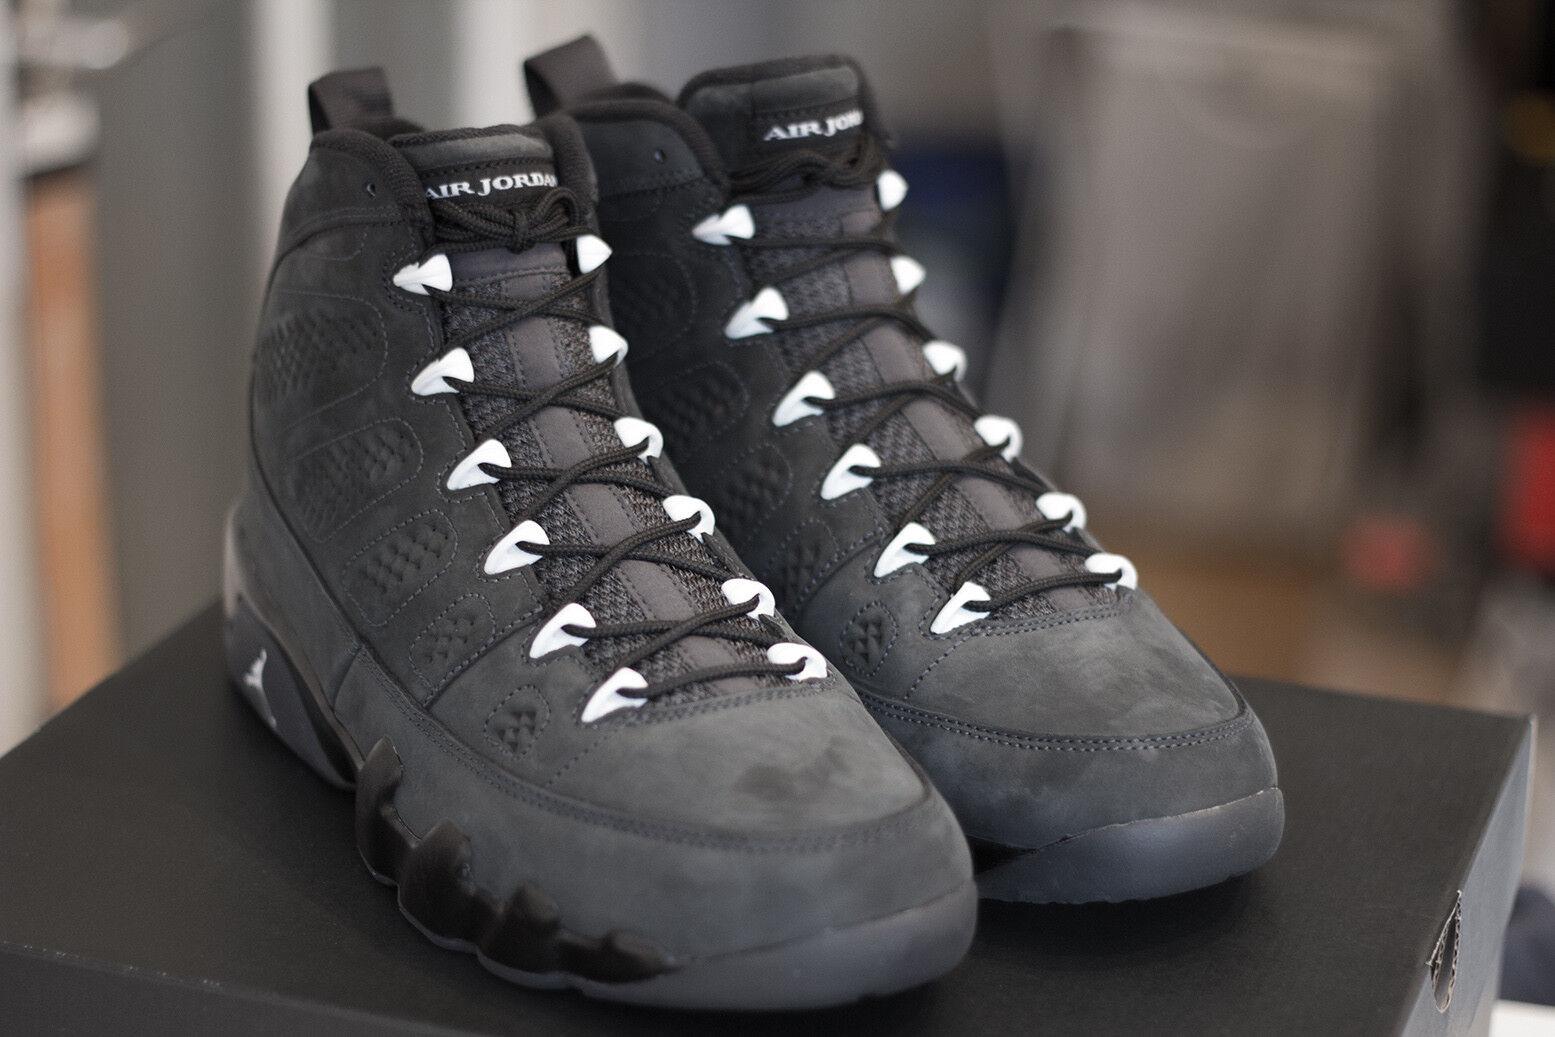 Nike Air Jordan 9 Anthracite 10 Grau Grau 10.5 44.5 3 6 5 10 Anthracite 2 Bin 23 302370 013 16c2bd